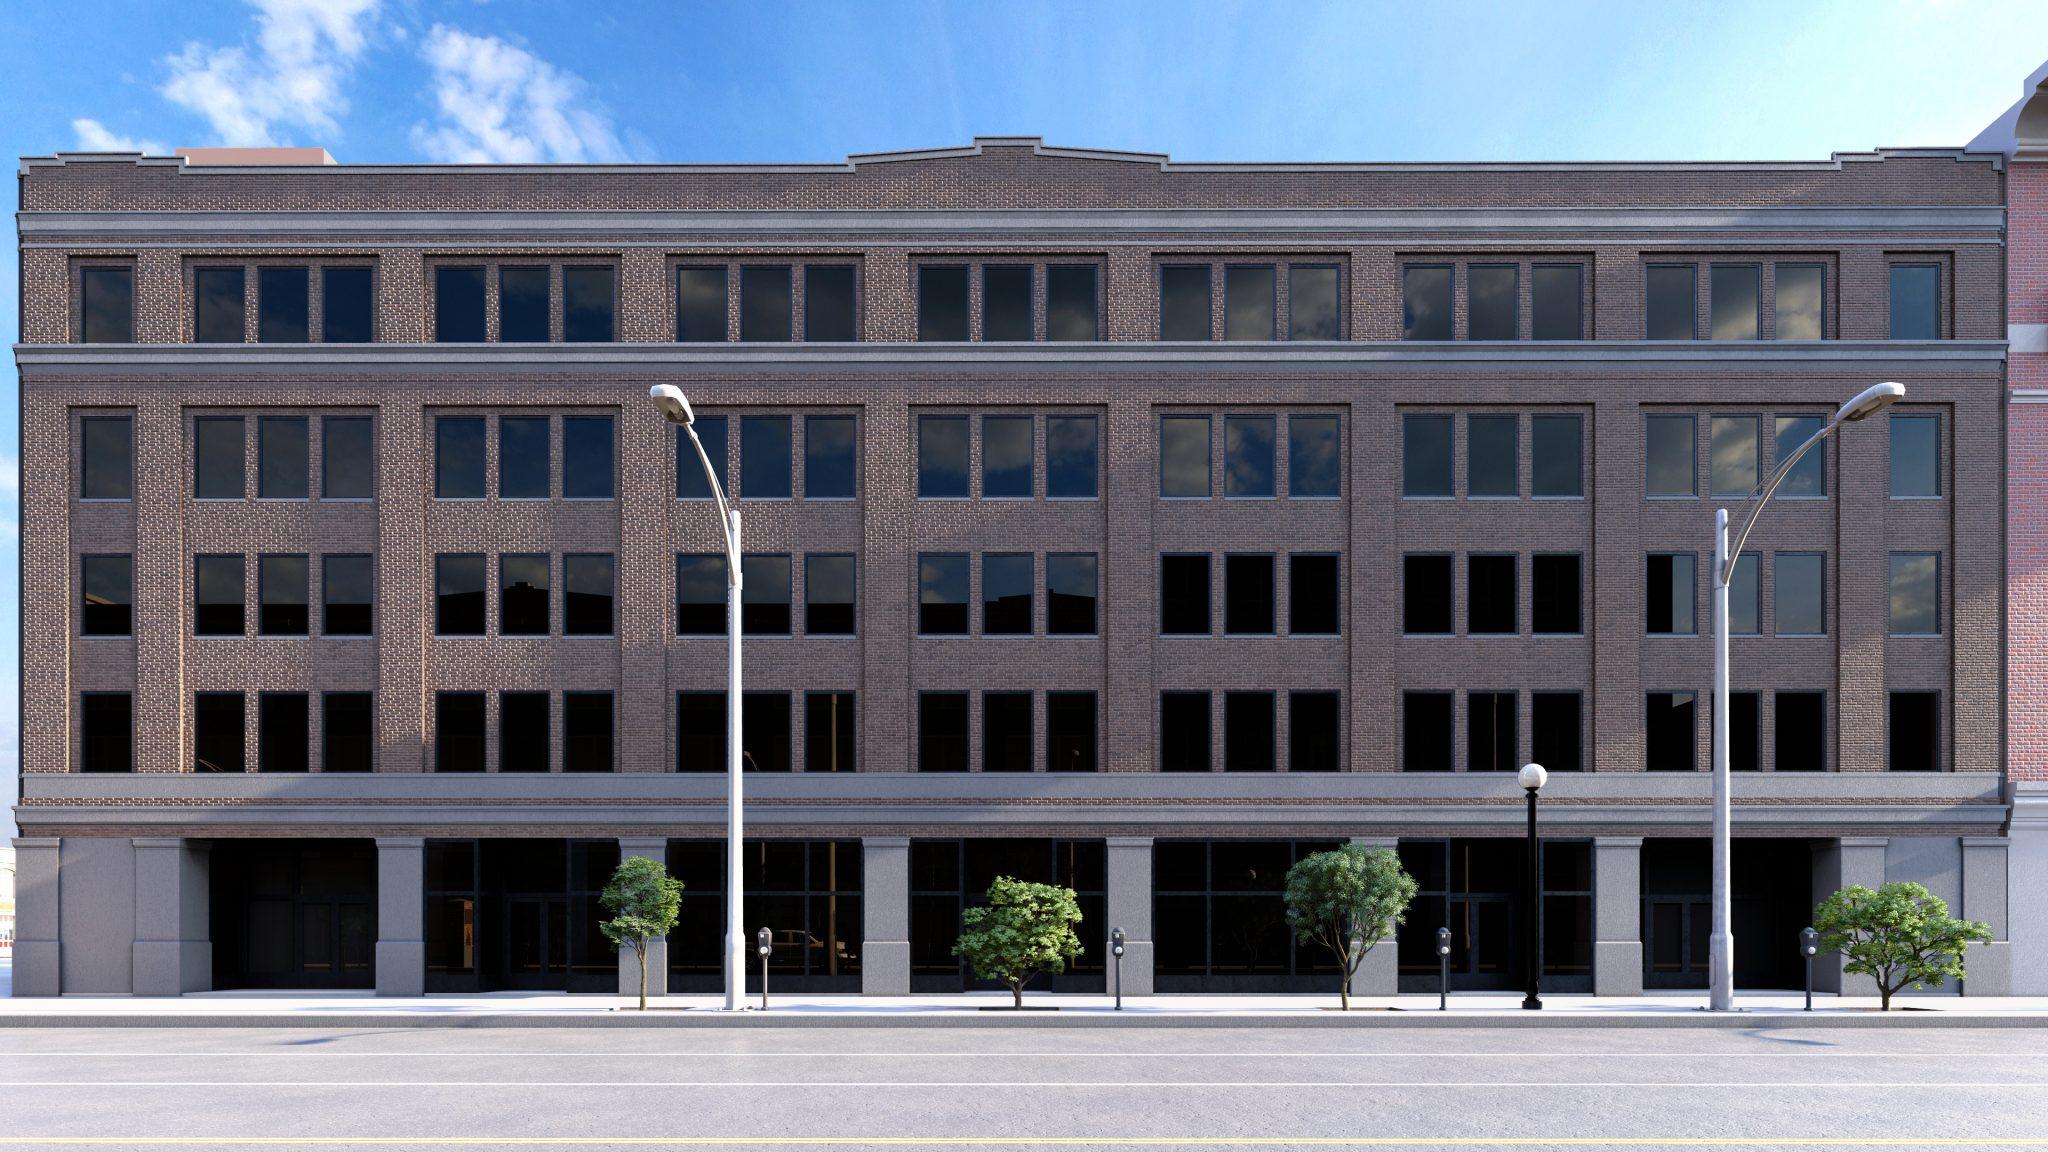 124 Building